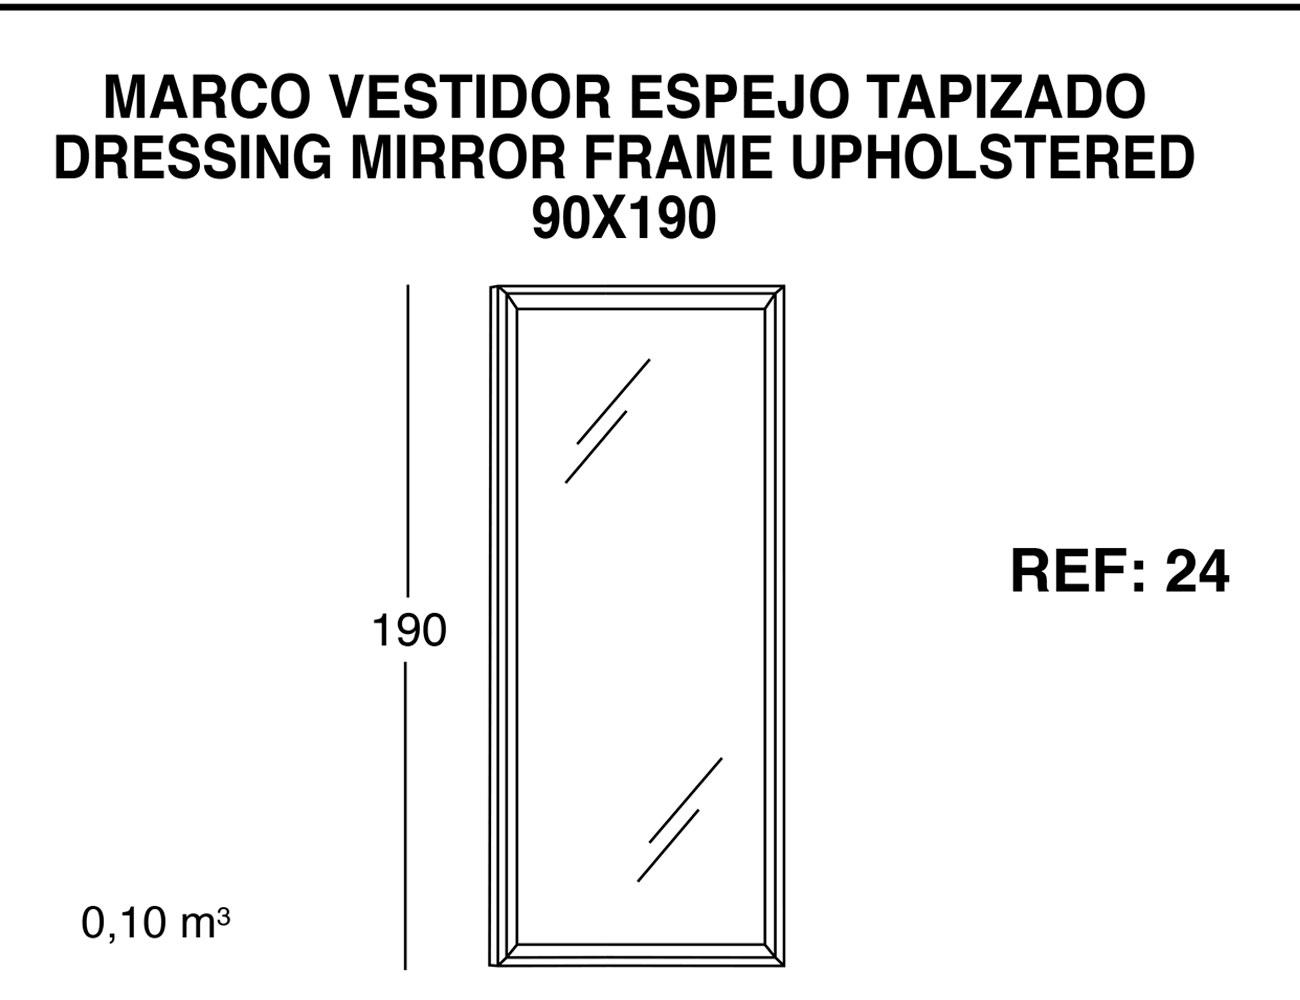 Marco vestidor espejo tapizado2